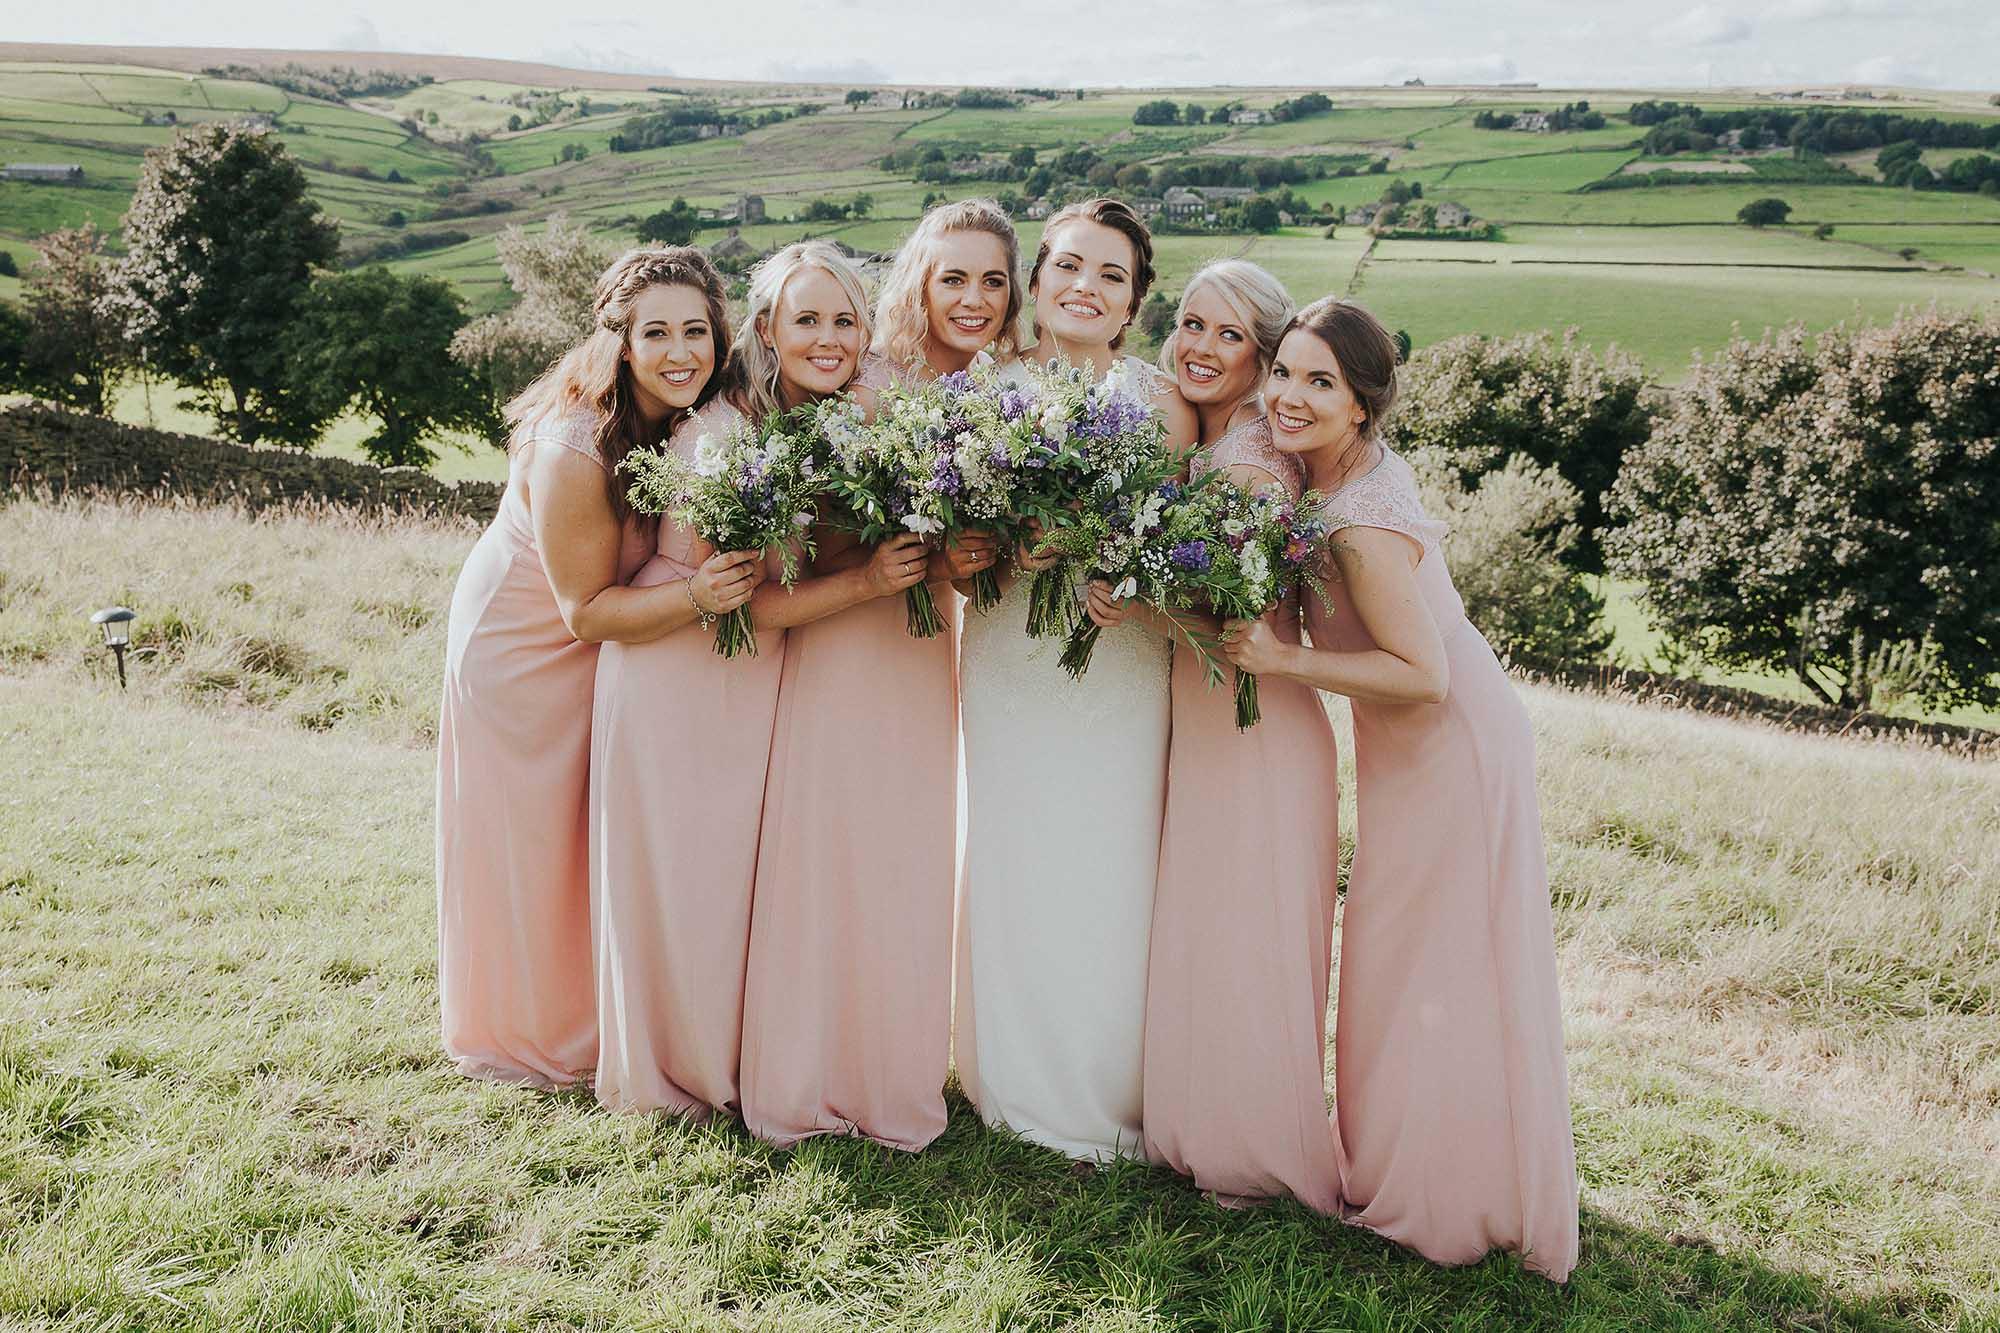 Ripponden bridesmaids